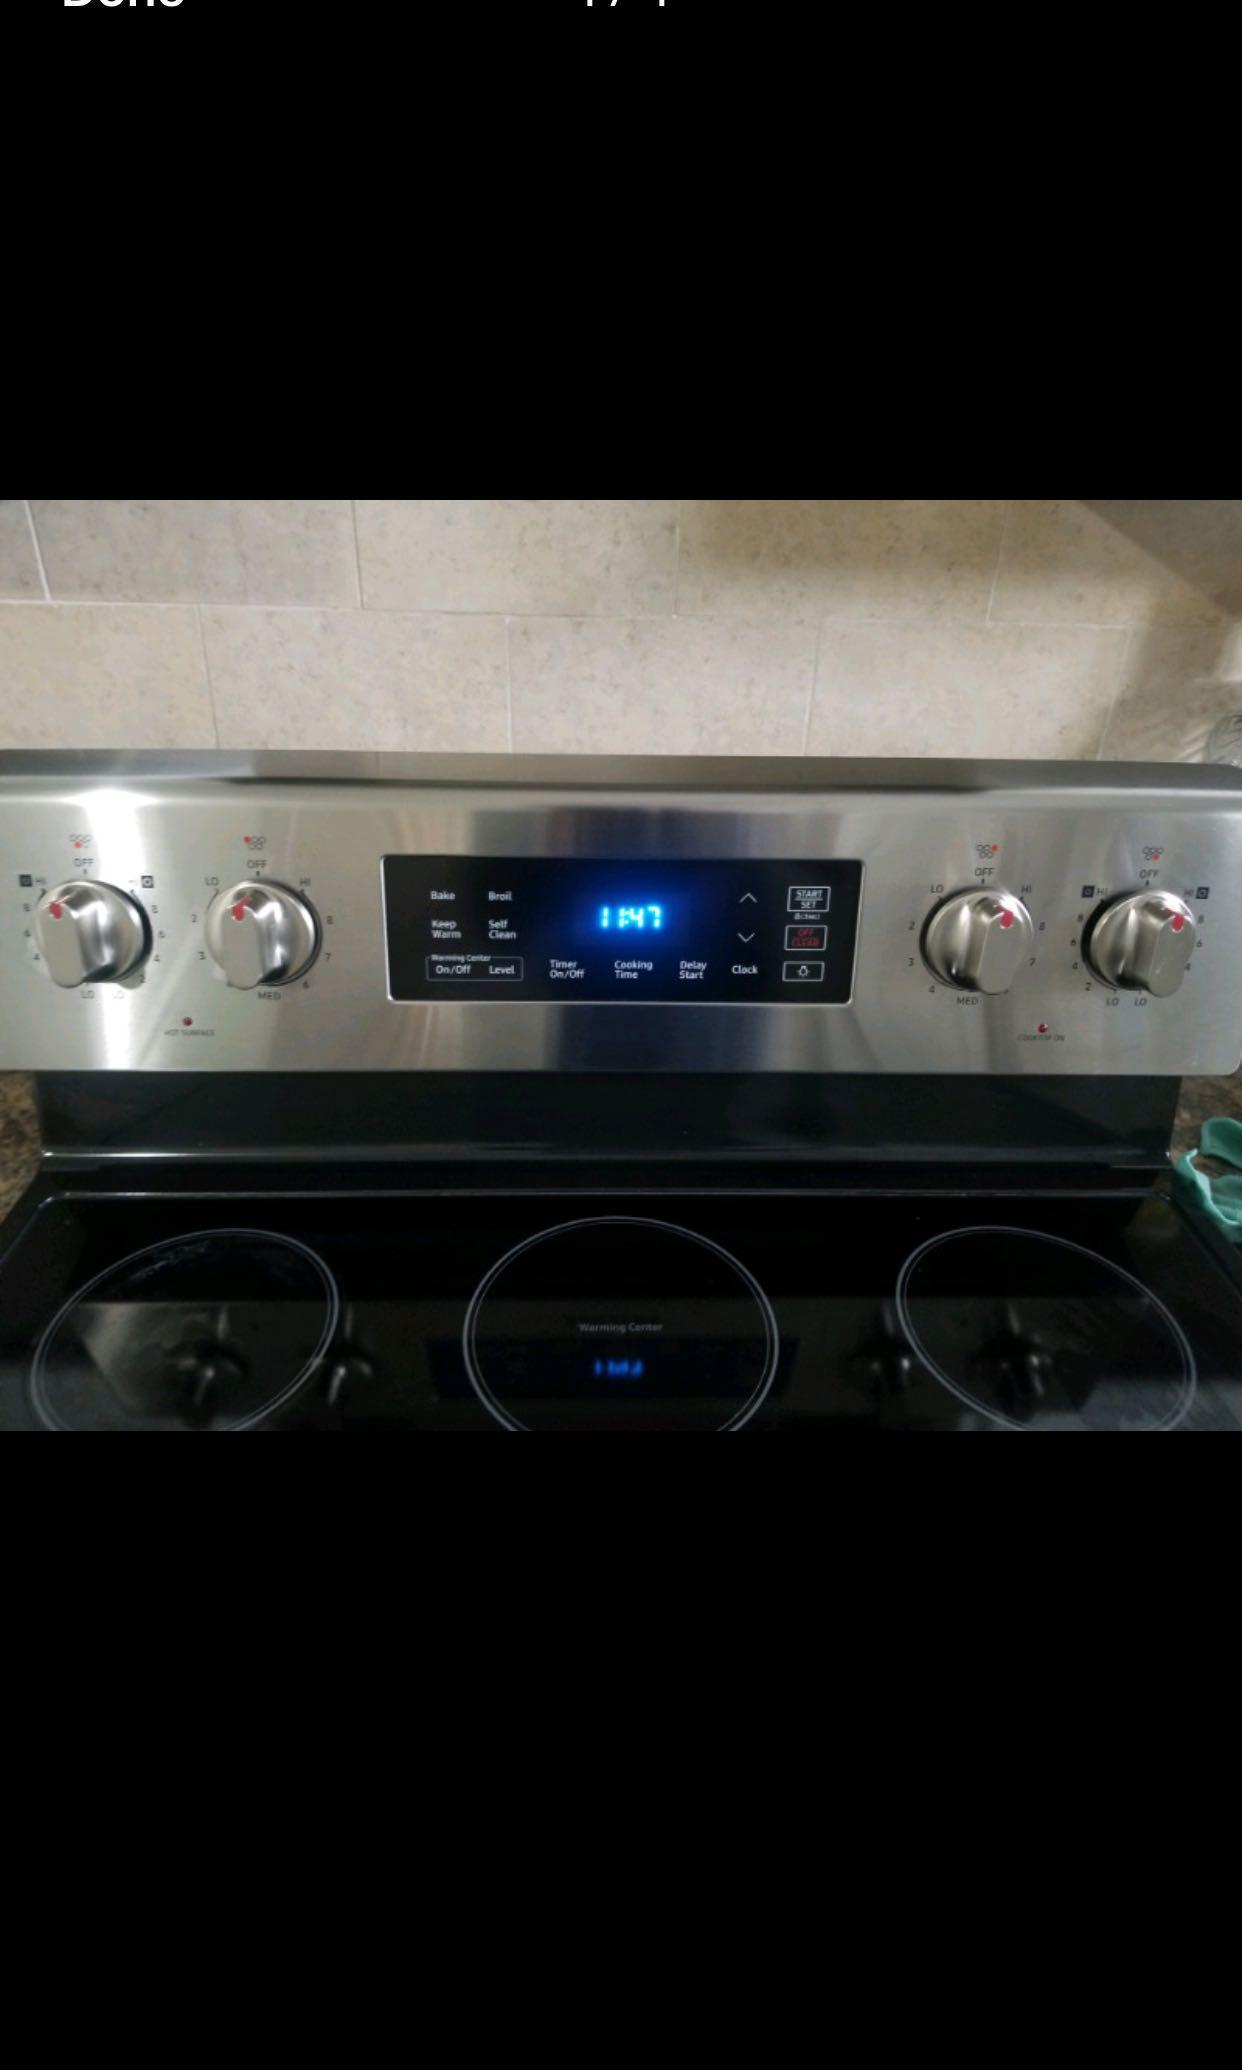 Brand new Samsung fridge and stove